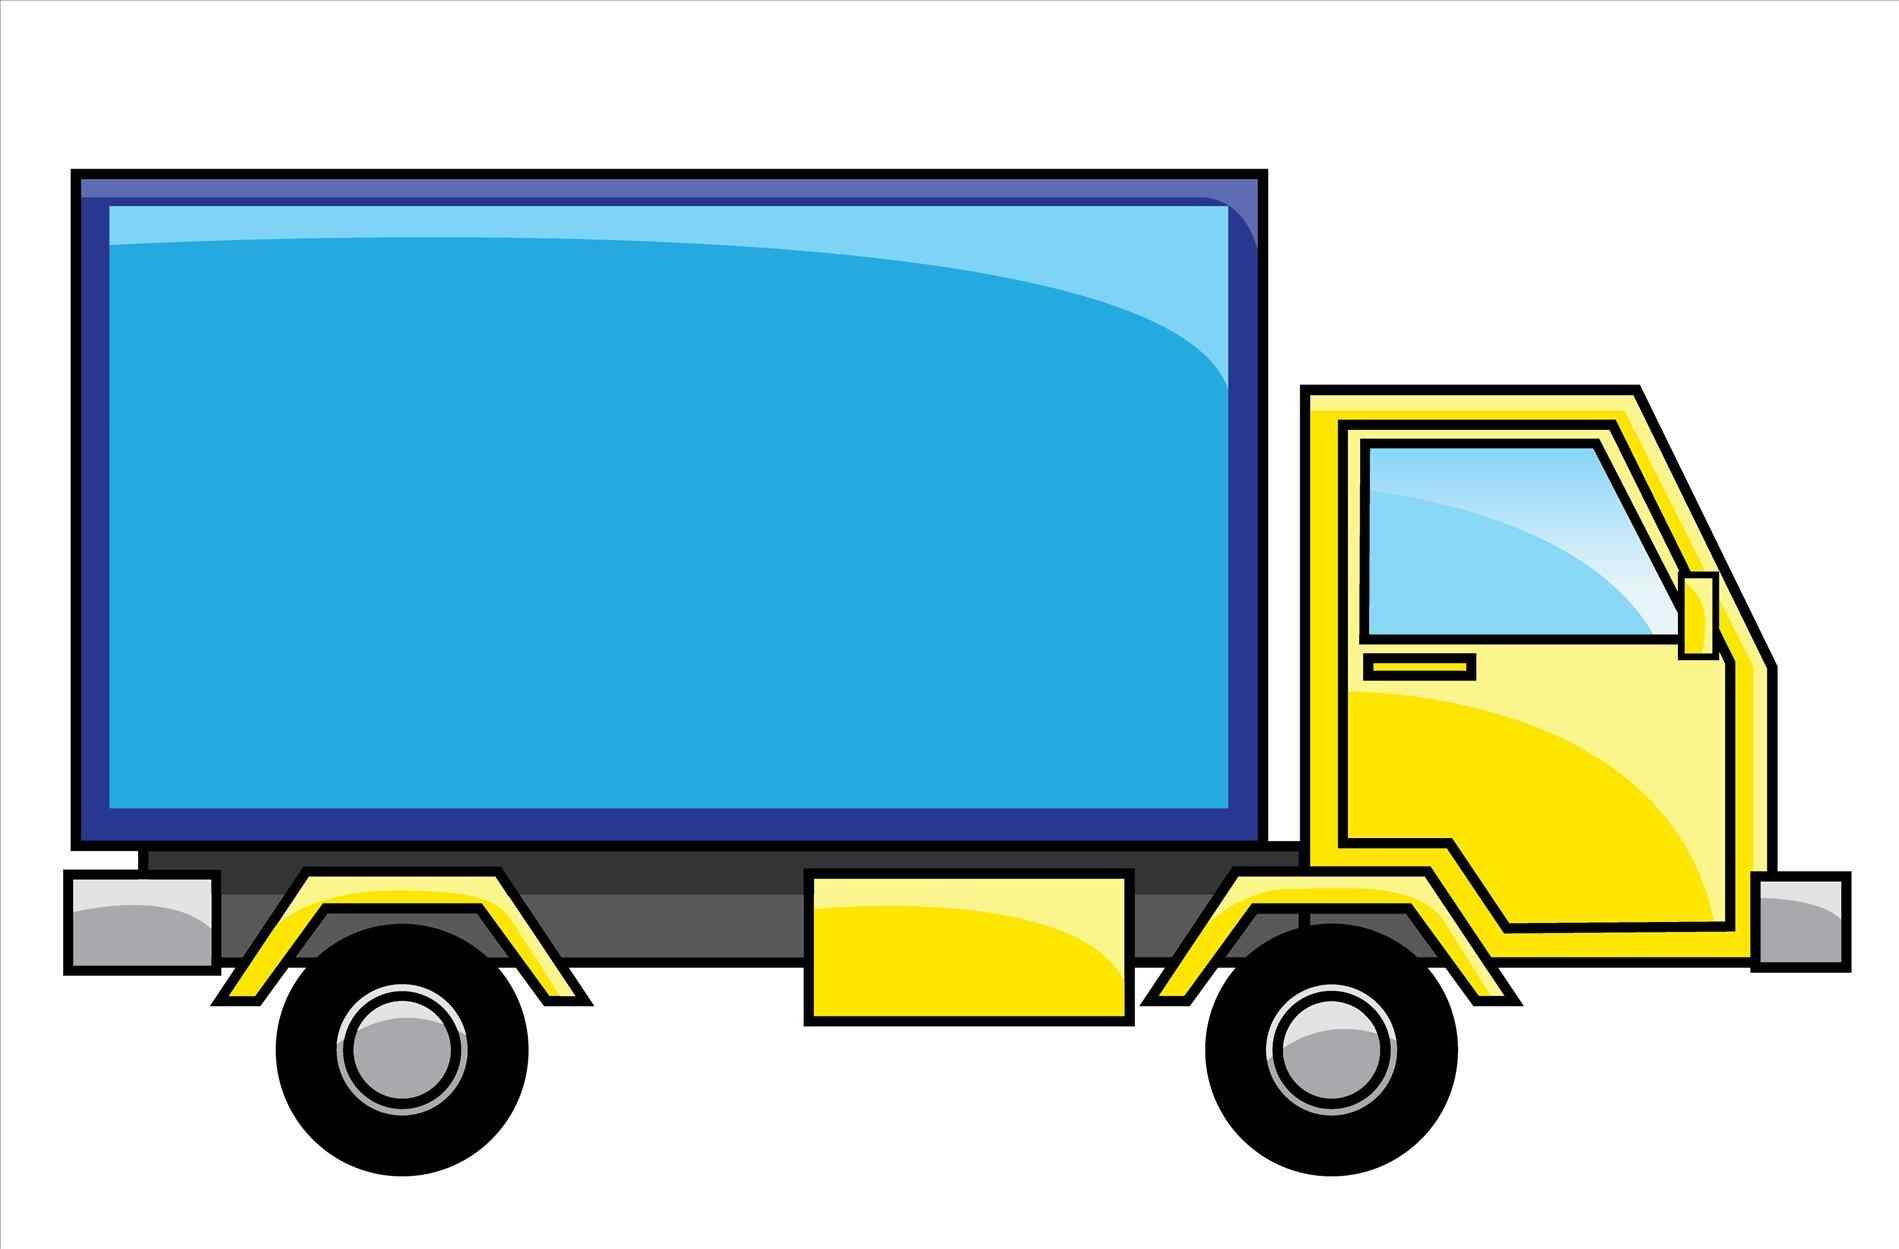 free photo truck clipart truck load industrial non commercial rh jooinn com clipart trucks free download monster truck clipart